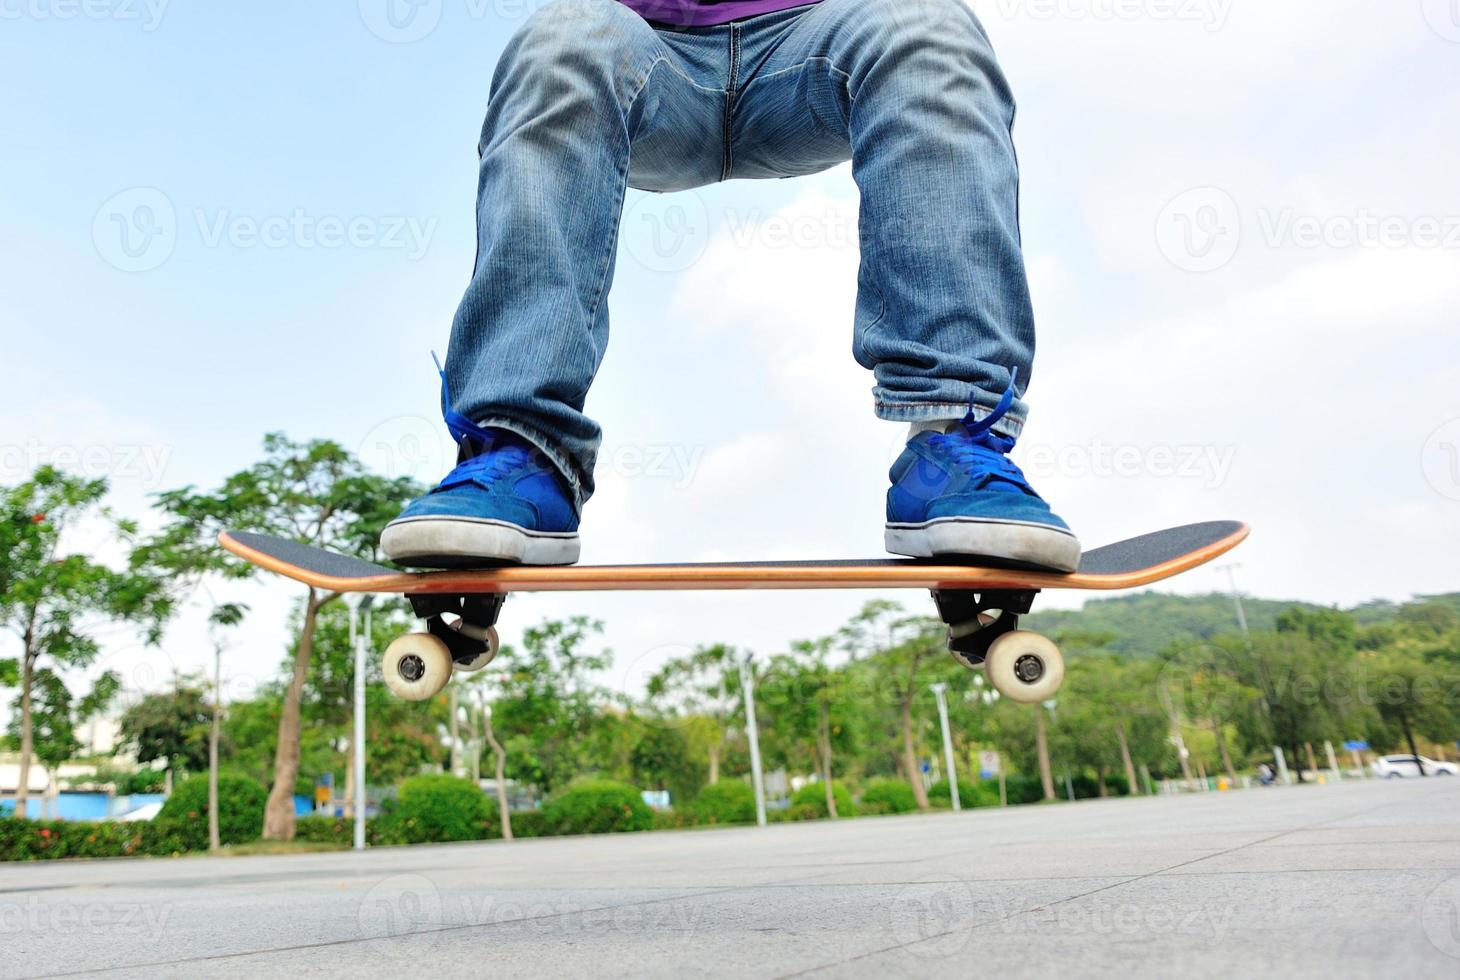 salto con lo skateboard foto